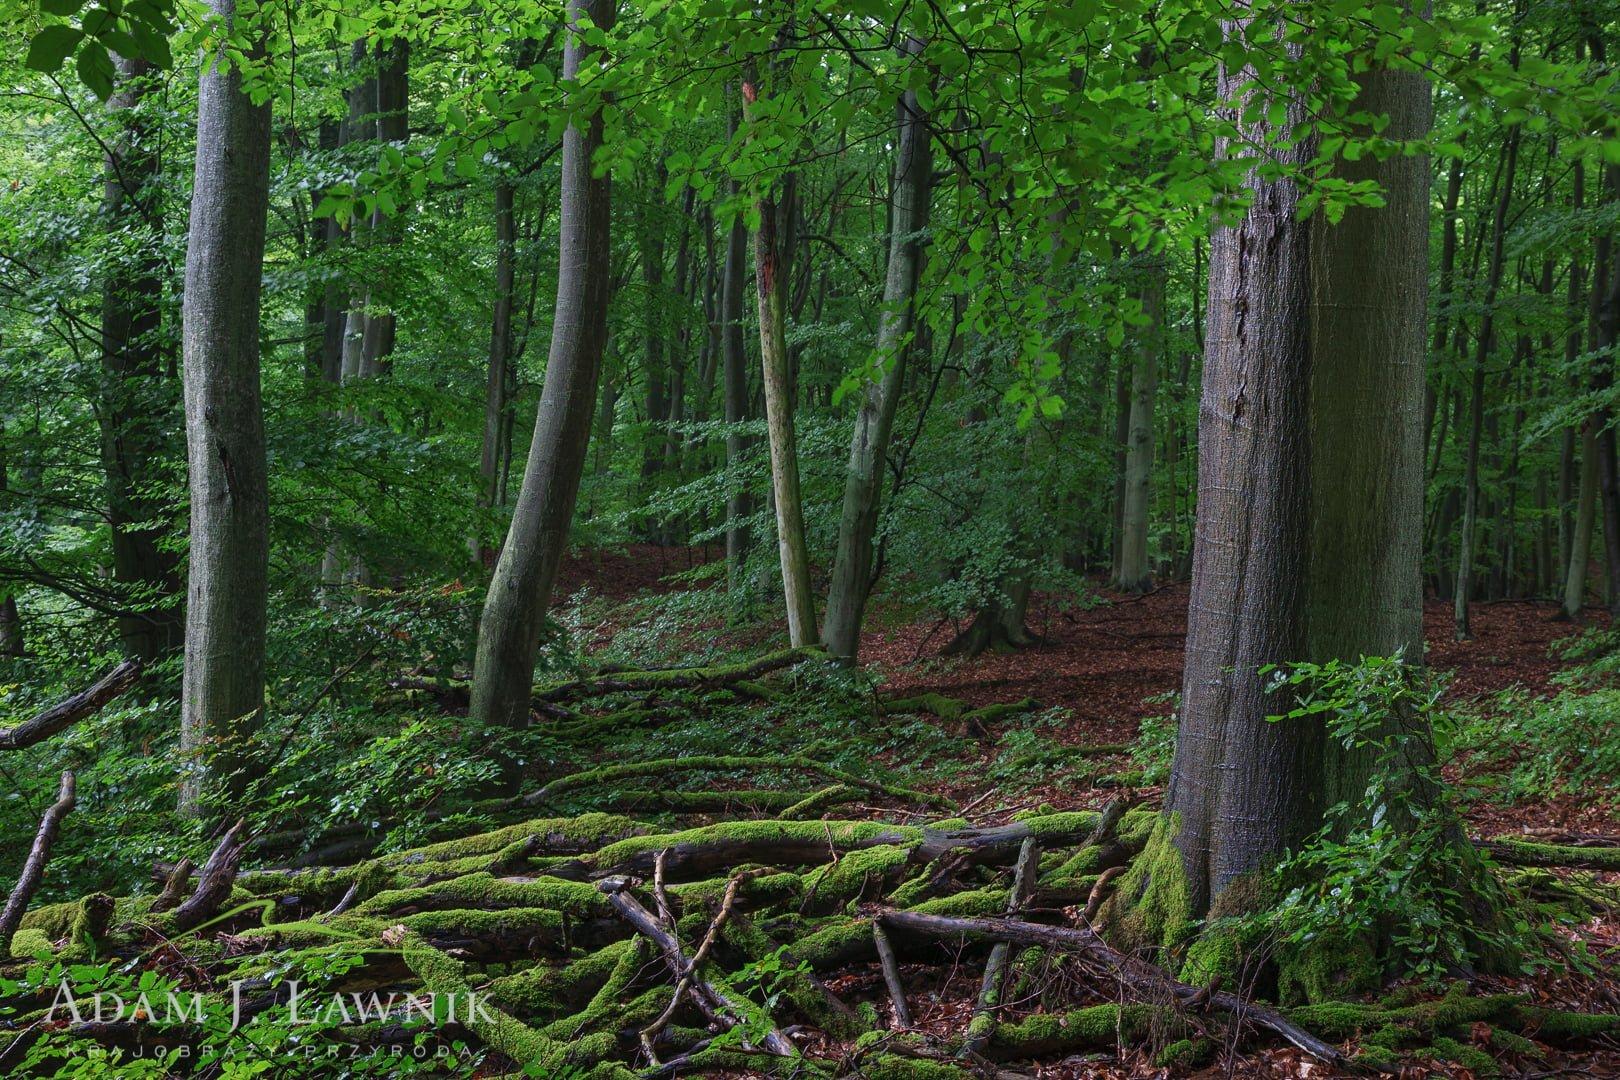 Wolin National Park, Poland 1008-00929C